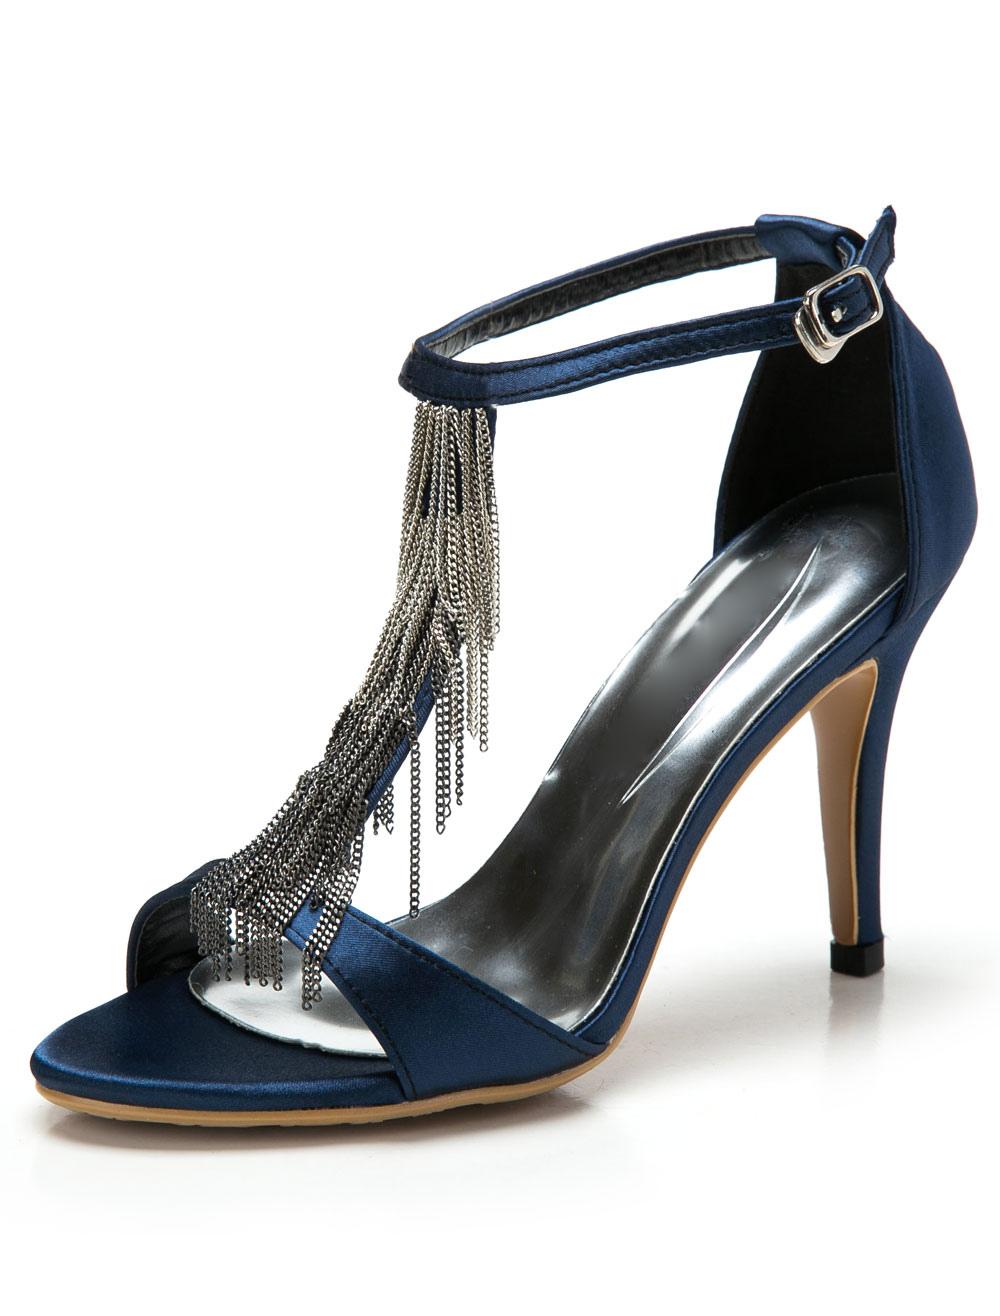 High Heel Sandals Blue T Type Sandal Shoes Satin 1920s Vintage Shoes